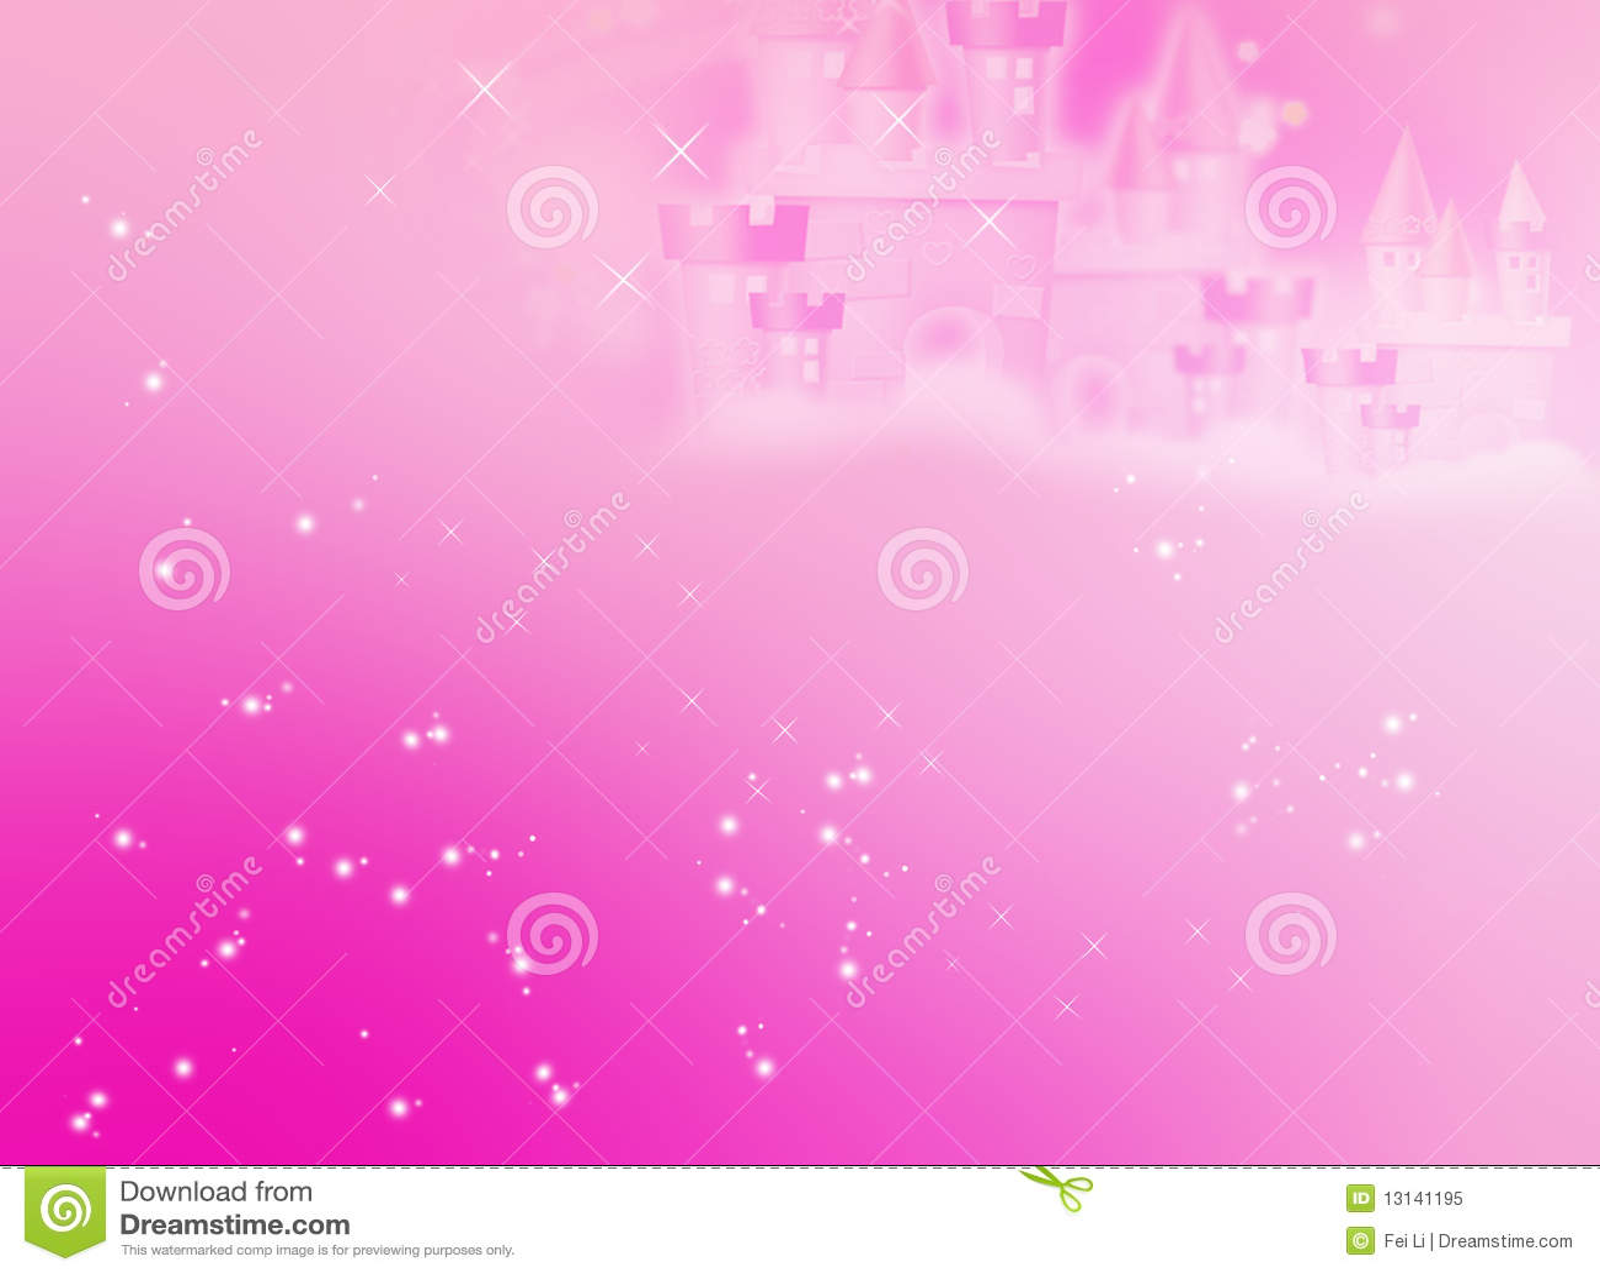 Pink Background Royalty Free Stock Photo Image 13141195